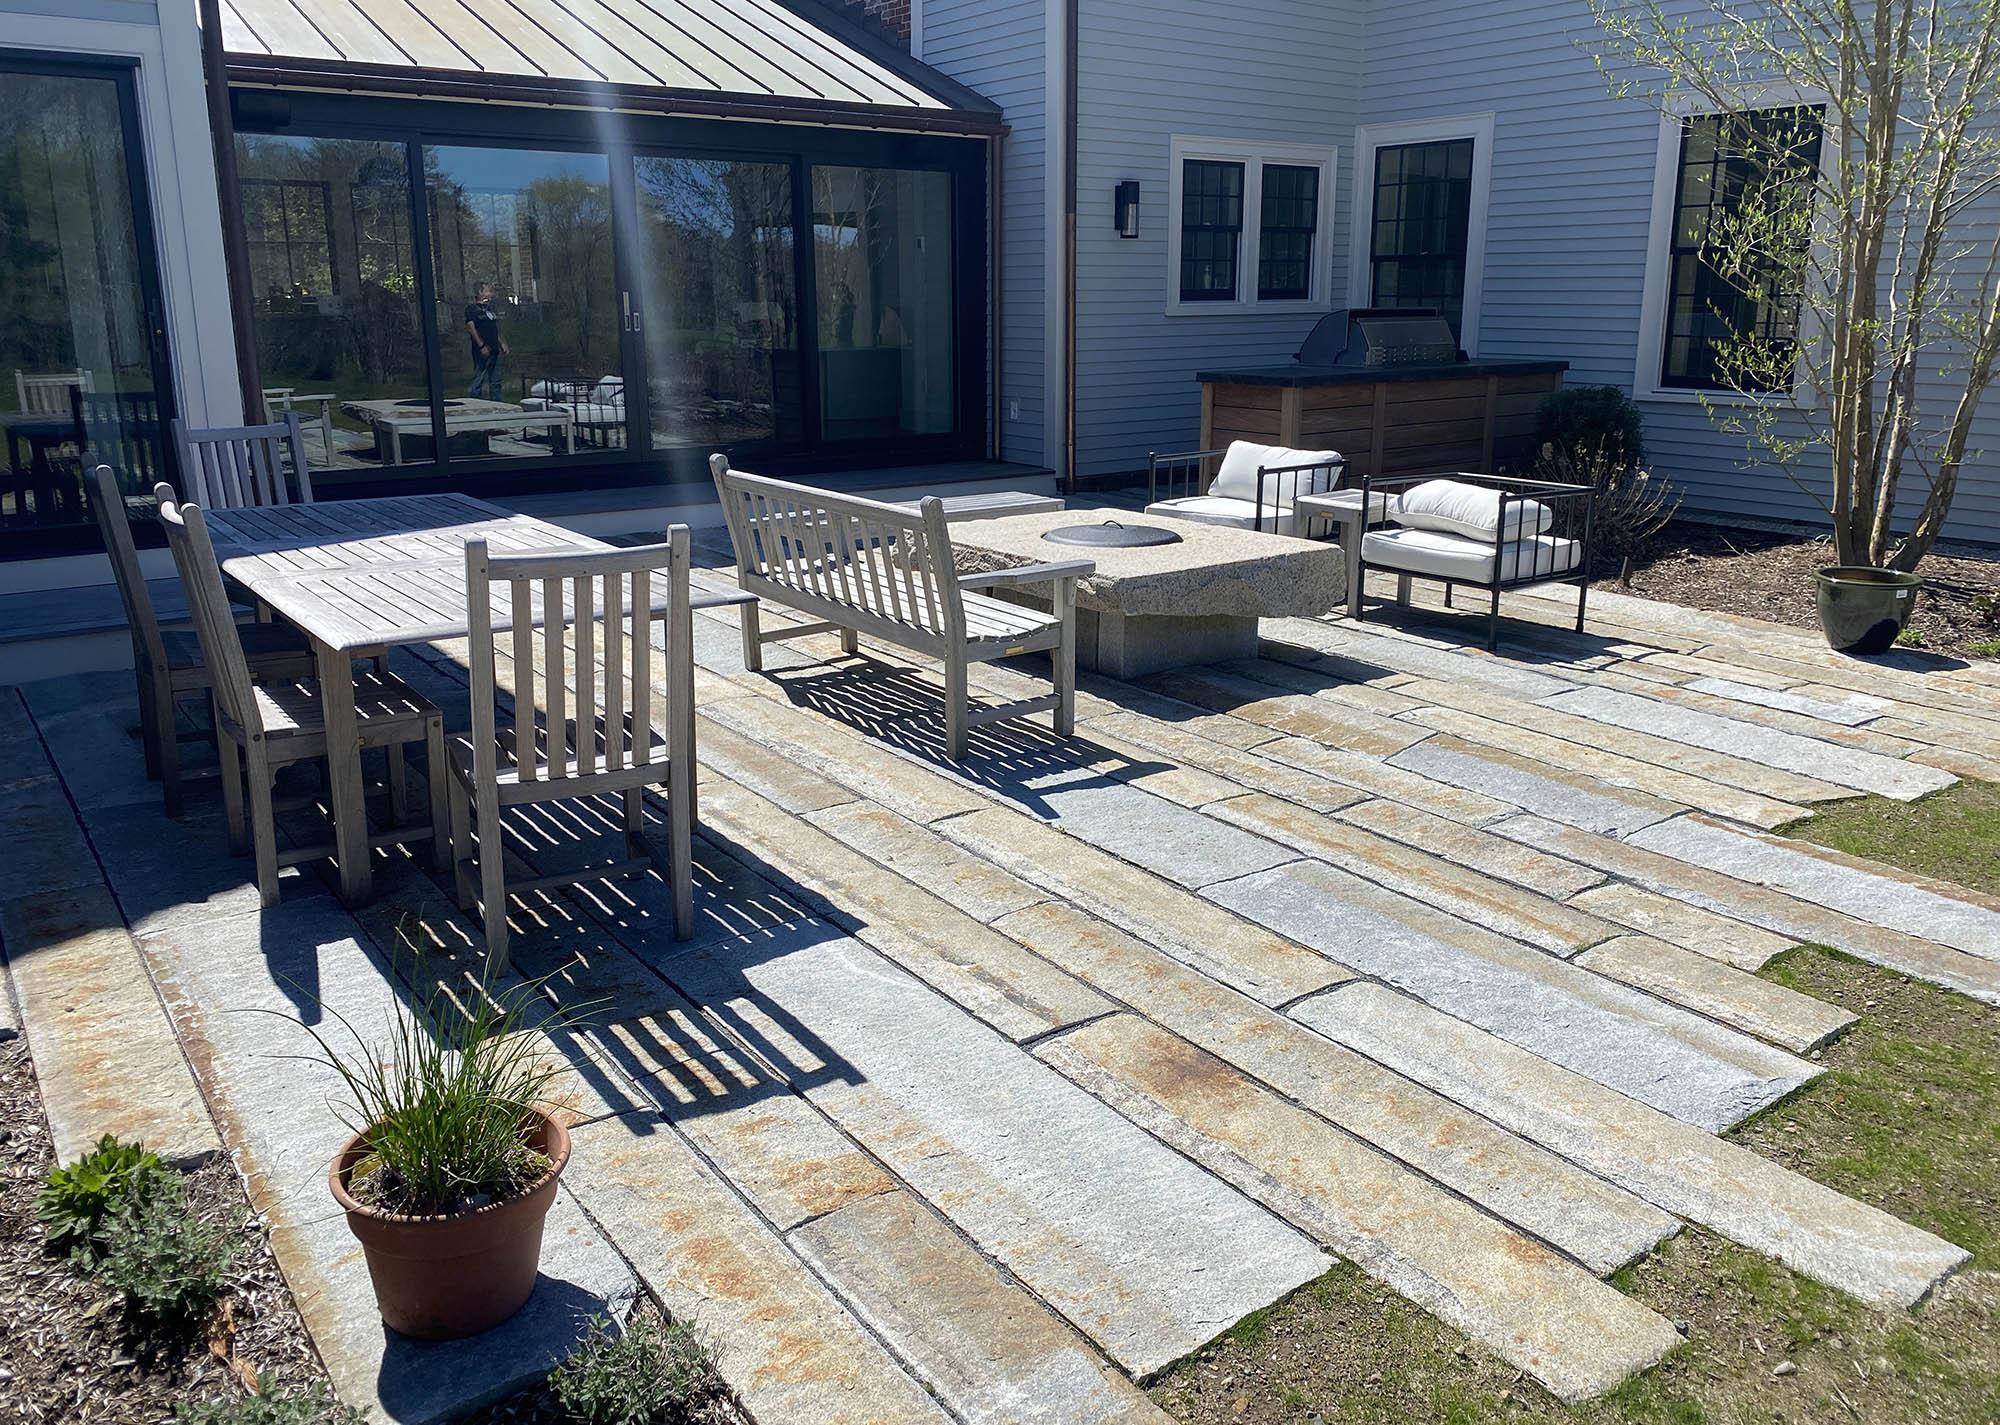 Reclaimed-third-generation-plank-paver-patio-2000x1425-1